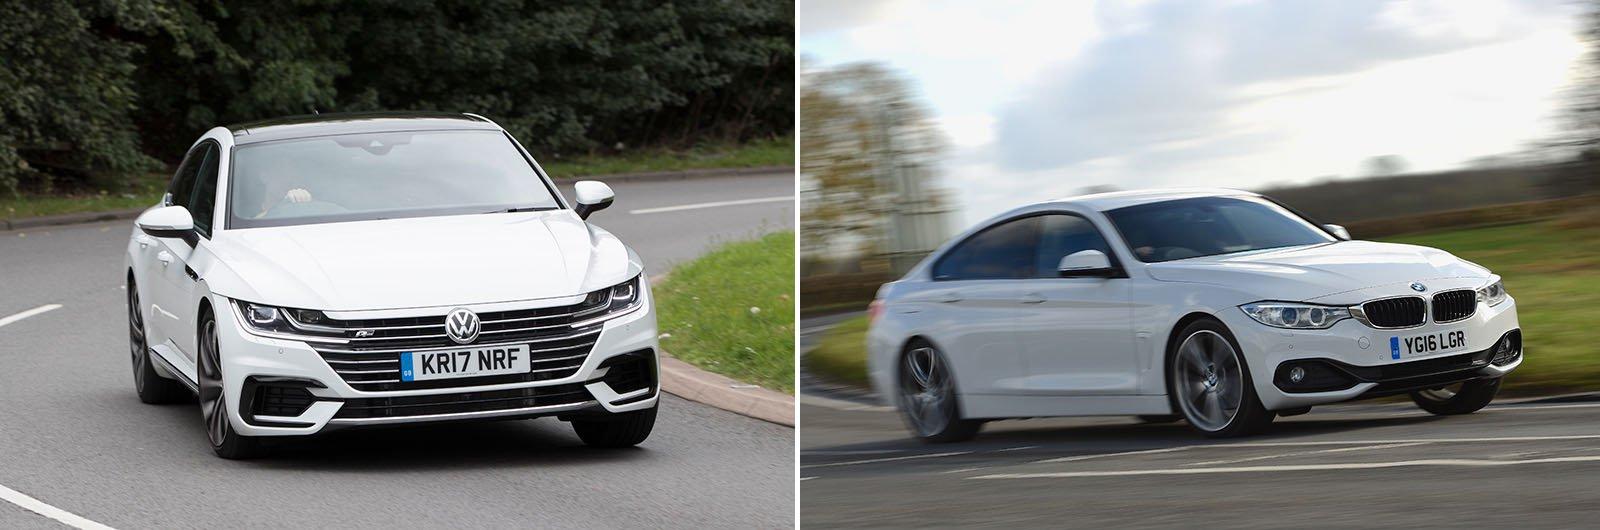 New Kia Stinger vs used BMW 5 Series – alternatives